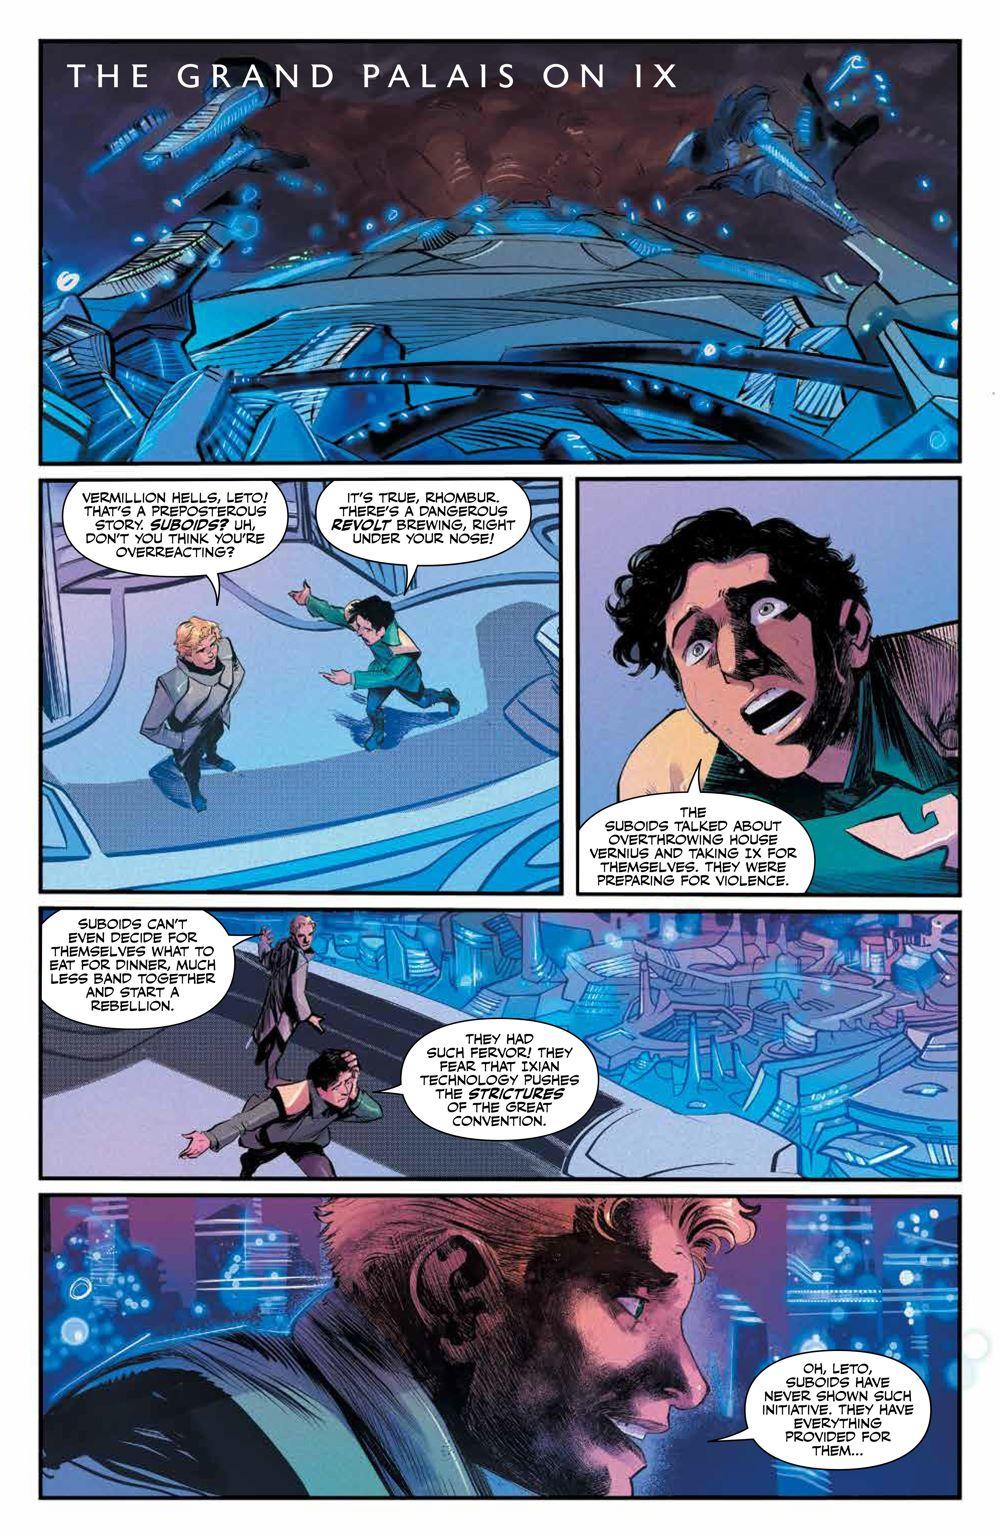 Dune_HouseAtreides_005_PRESS_7 ComicList Previews: DUNE HOUSE ATREIDES #5 (OF 12)